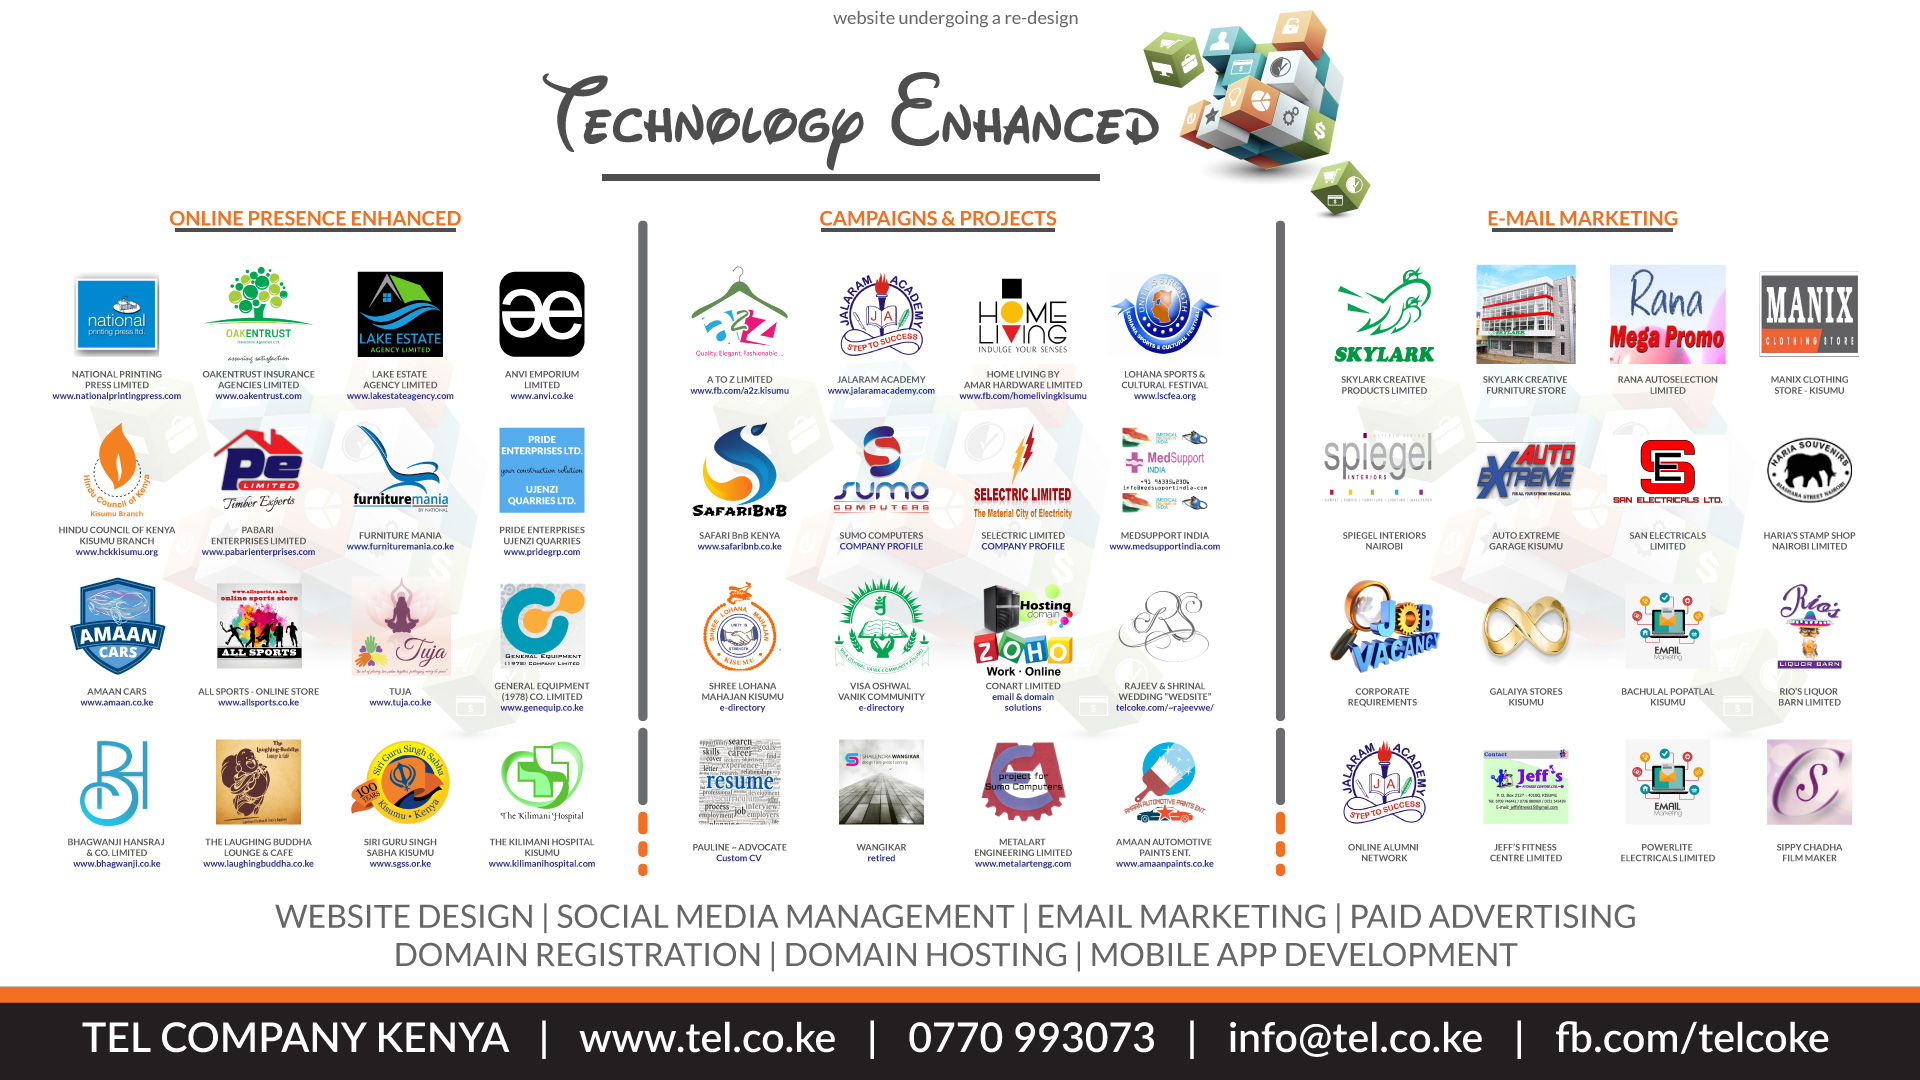 Portfolio of Technology Enhanced!